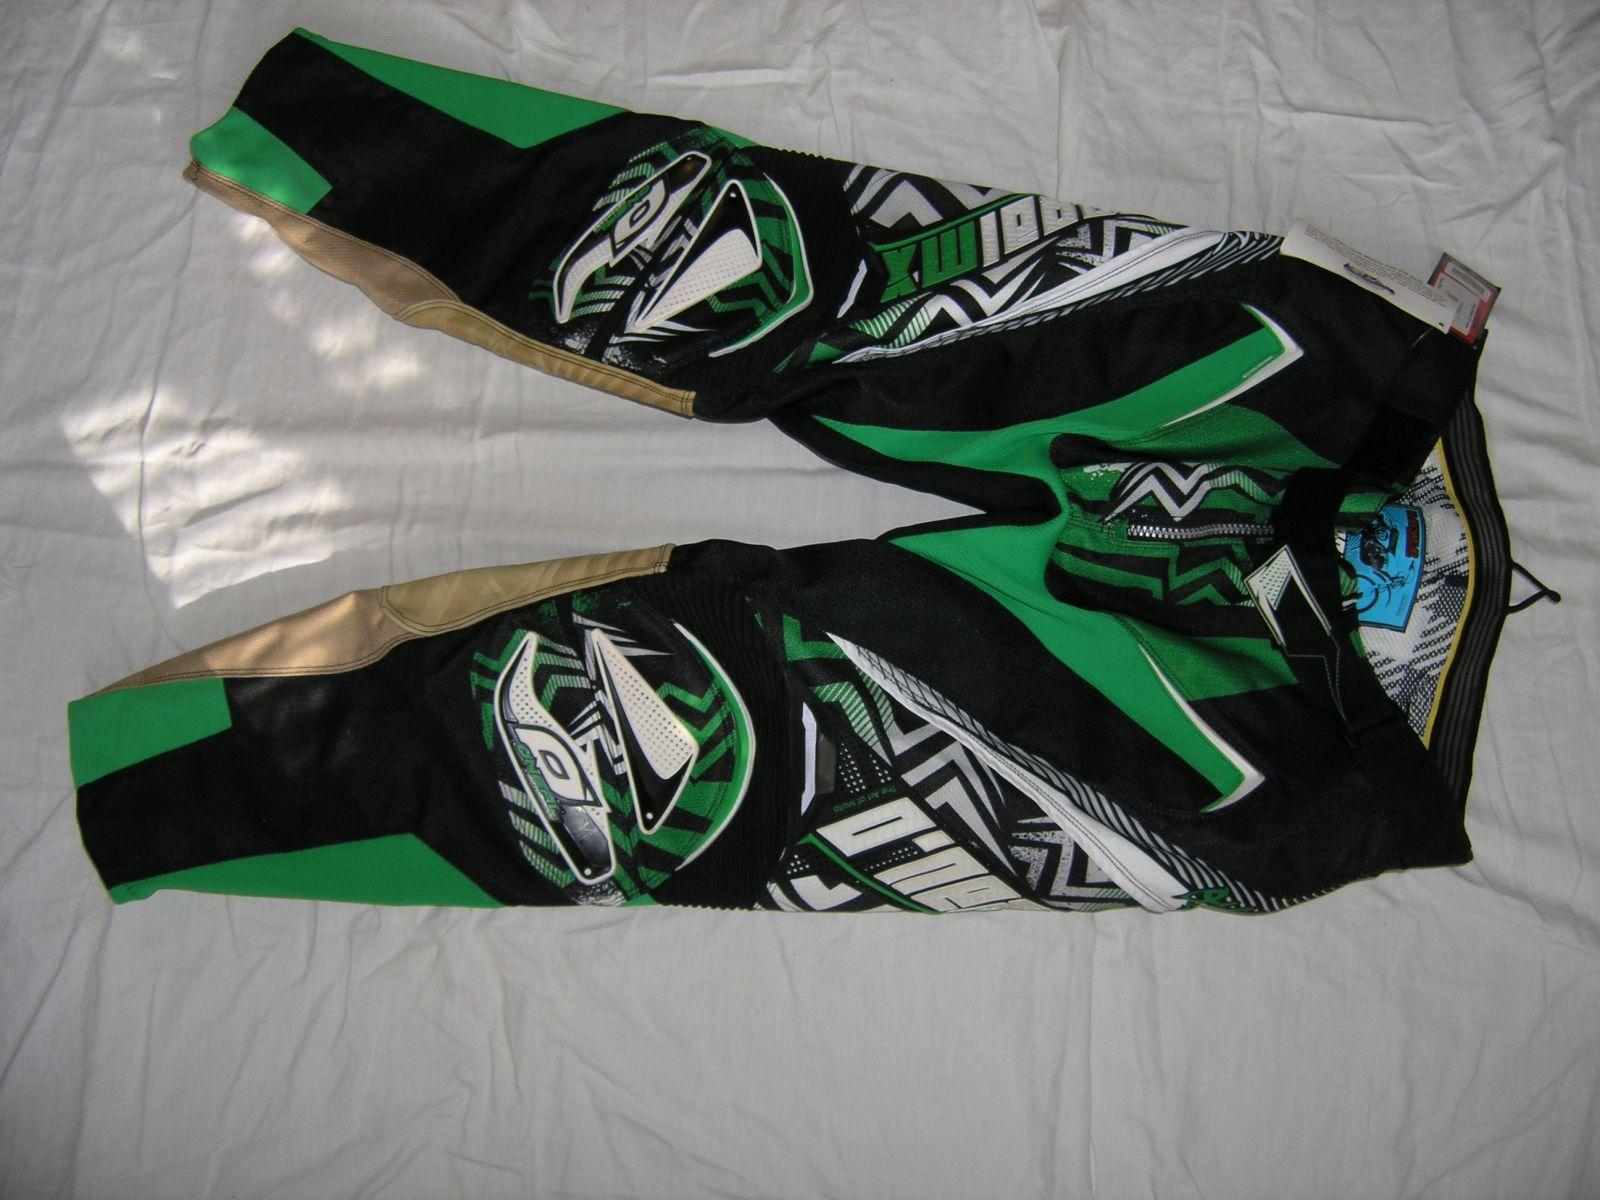 Kalhoty Hardwear 2011 Zelená ONEAL